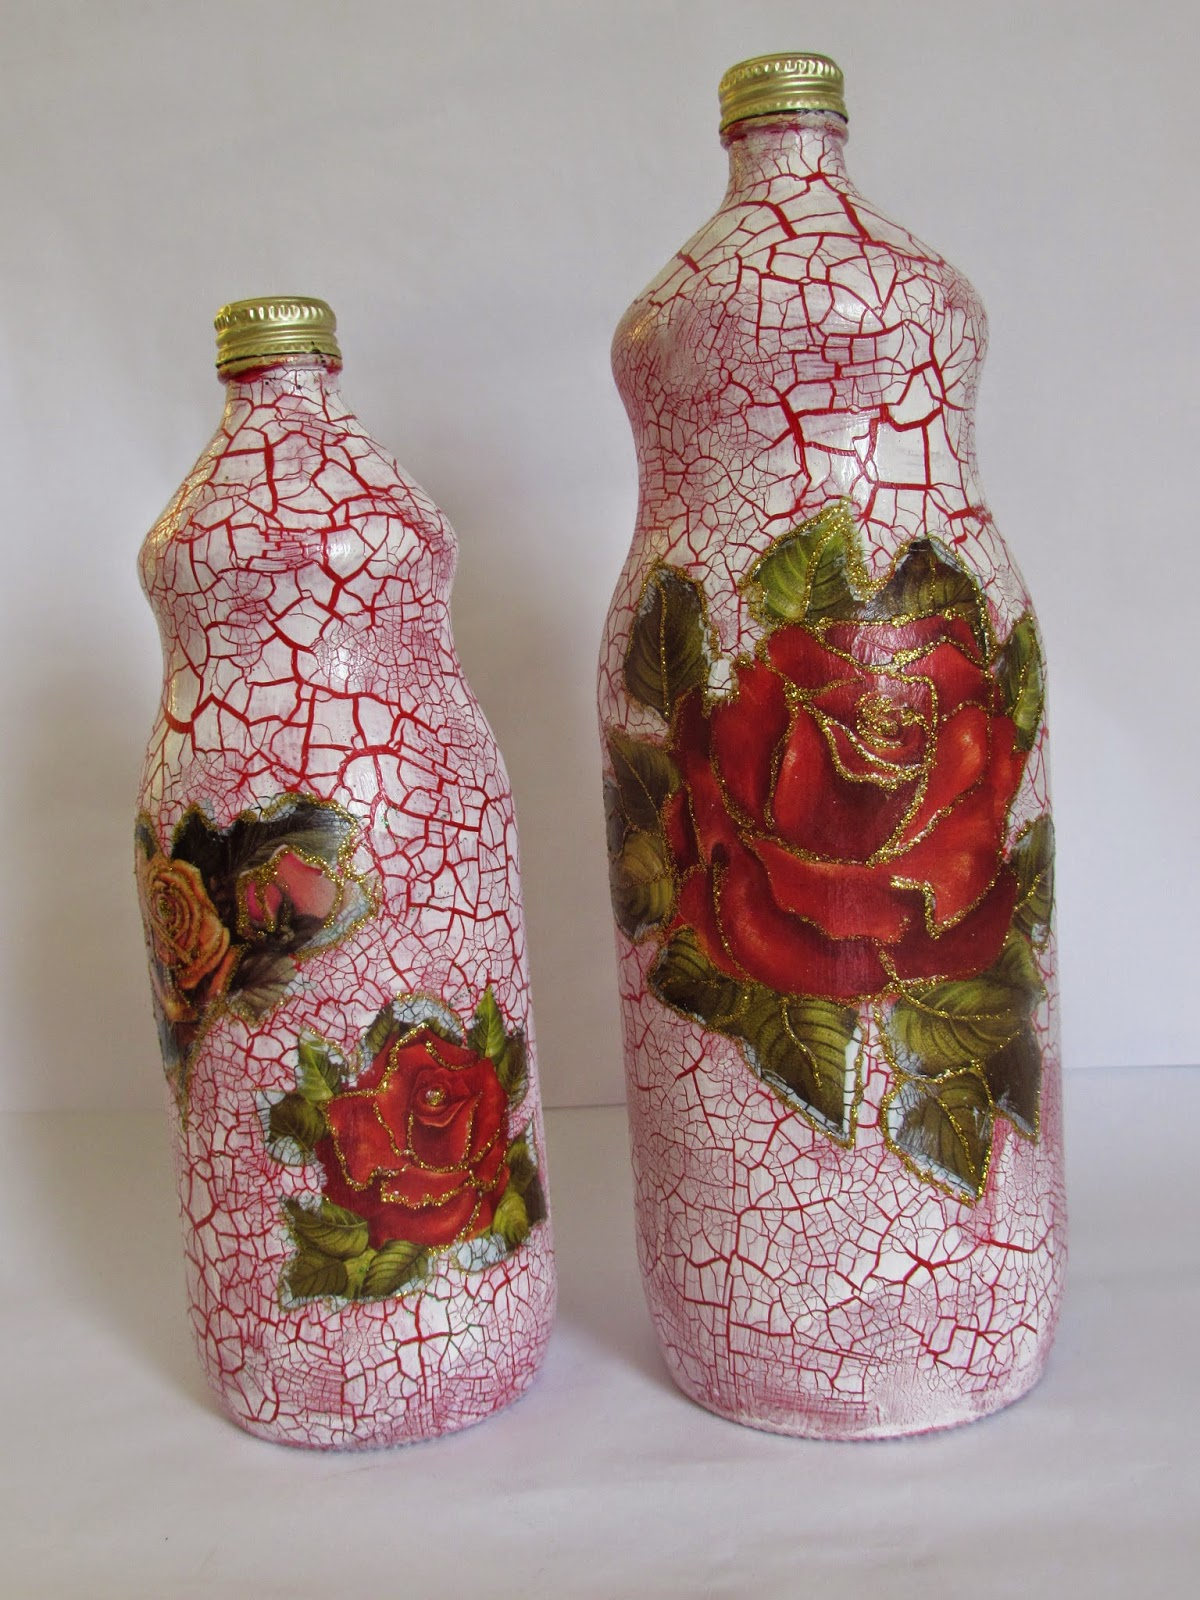 Armario Limpieza Conforama ~ Cantinho Arlearte Artesanato Garrafa de vidro craquelada e decorada